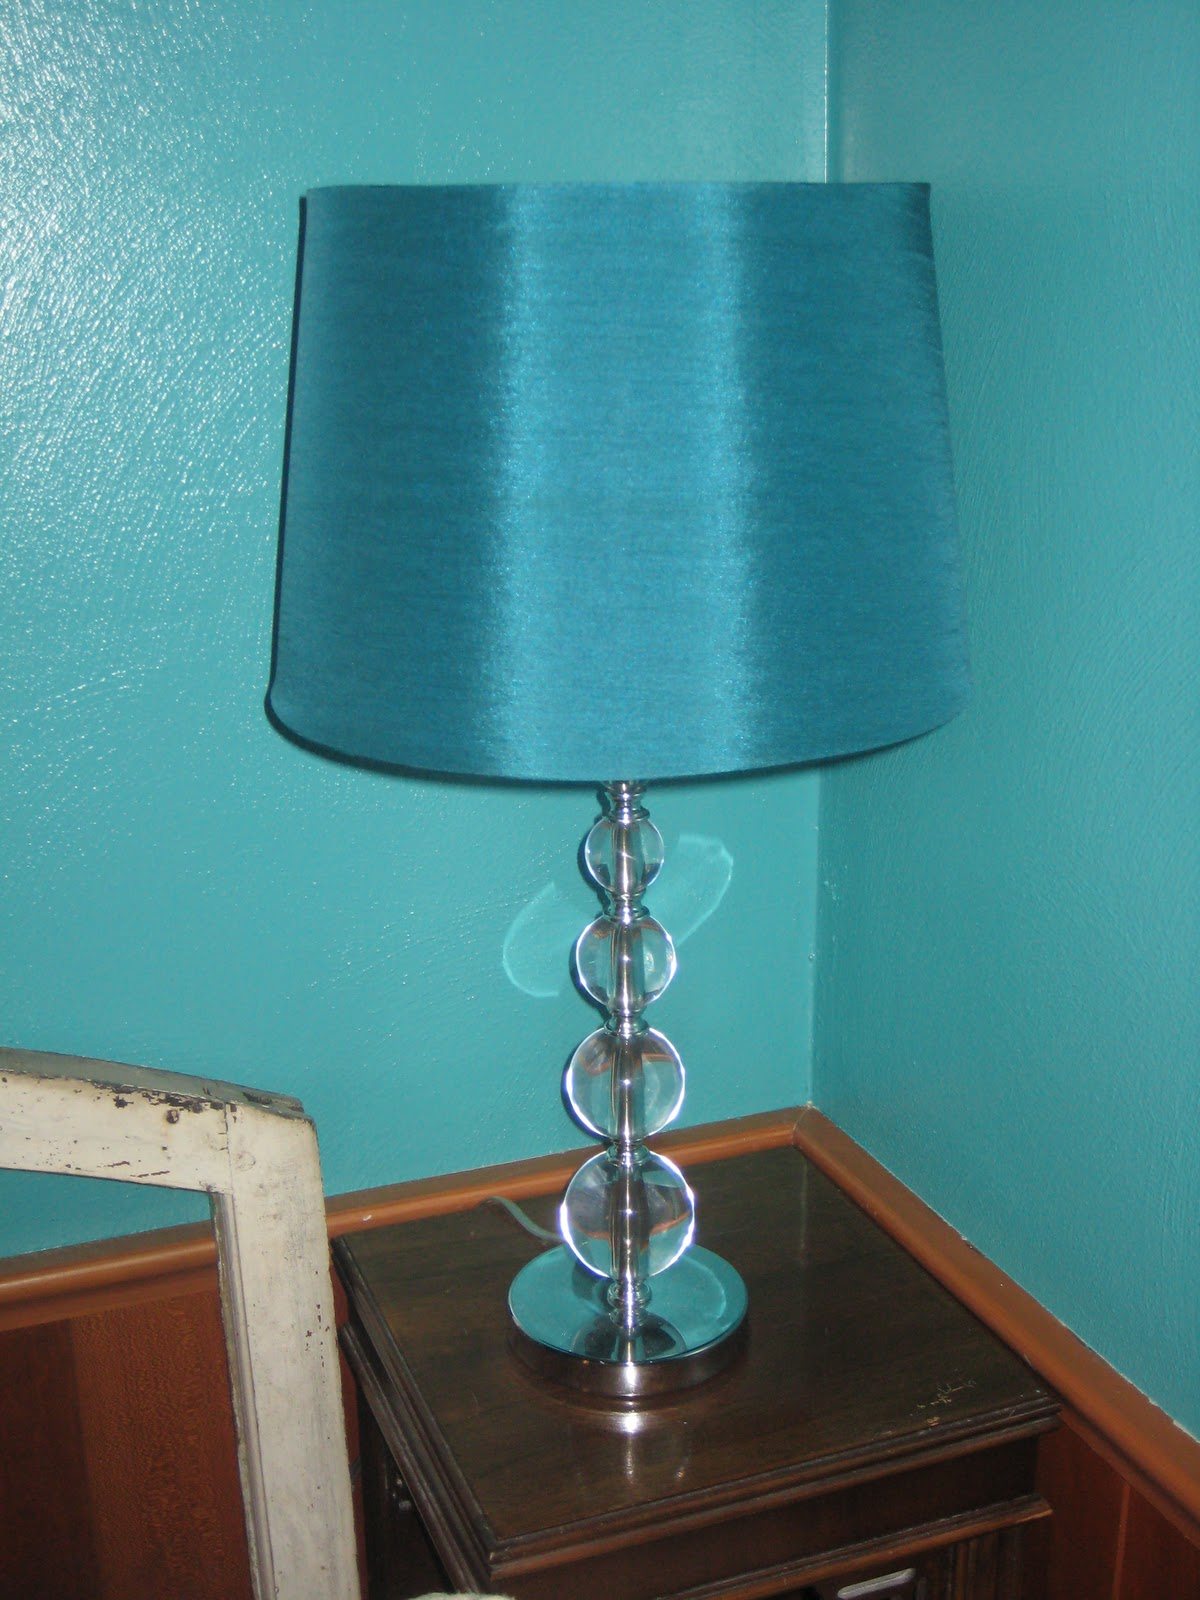 Lamp Shades Target | www.imgkid.com - The Image Kid Has It!